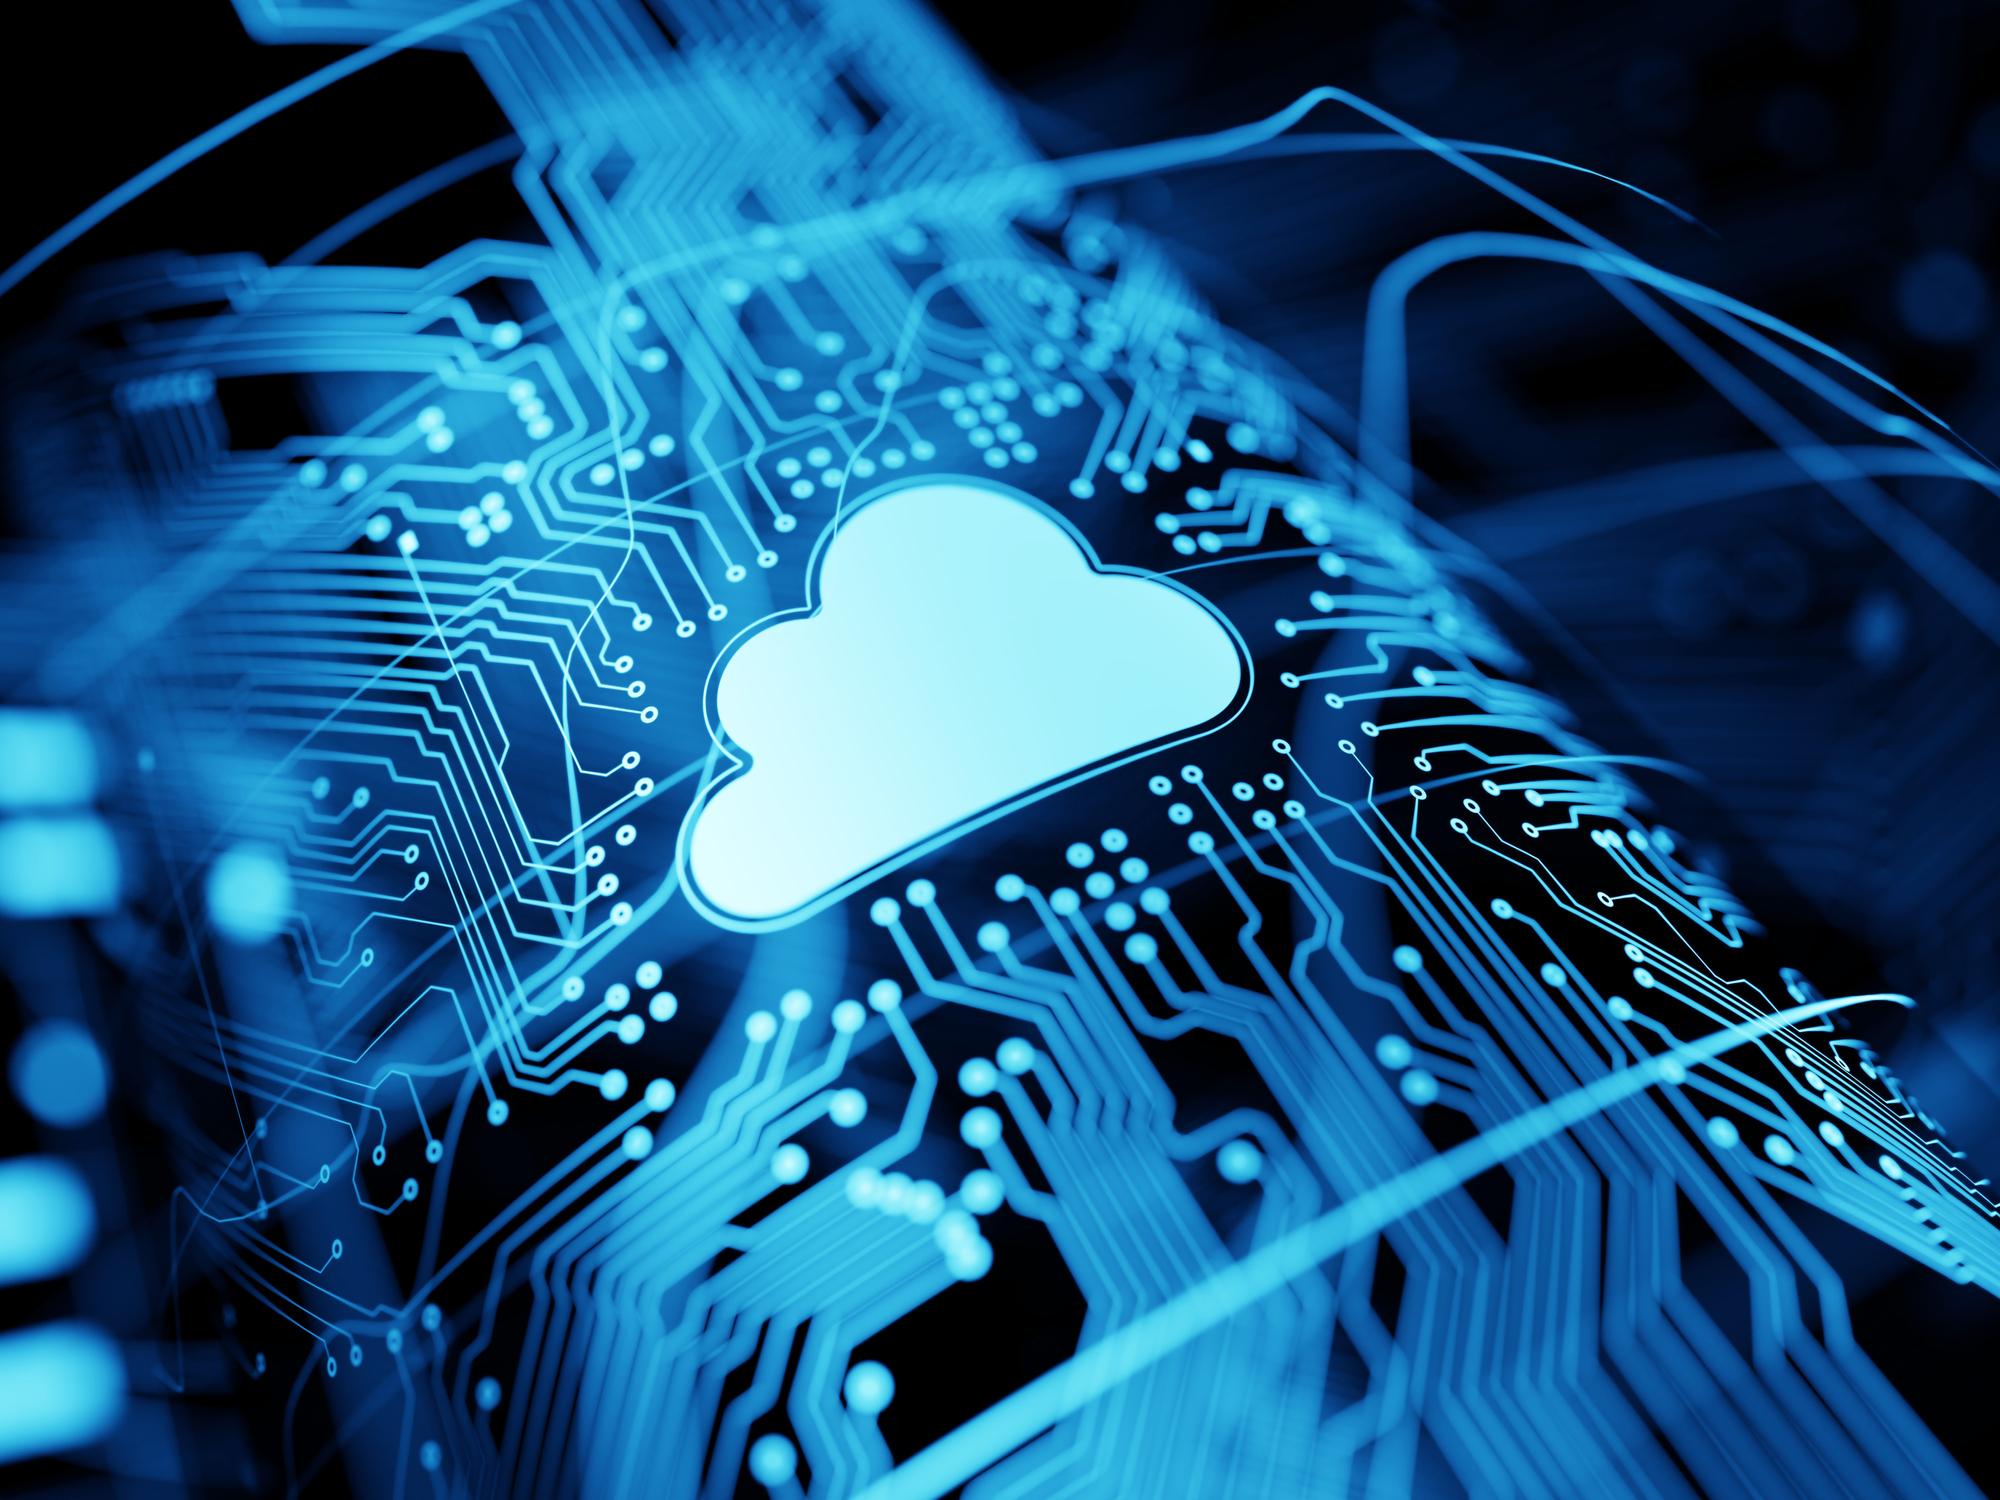 Digital circuits connecting to a digital cloud